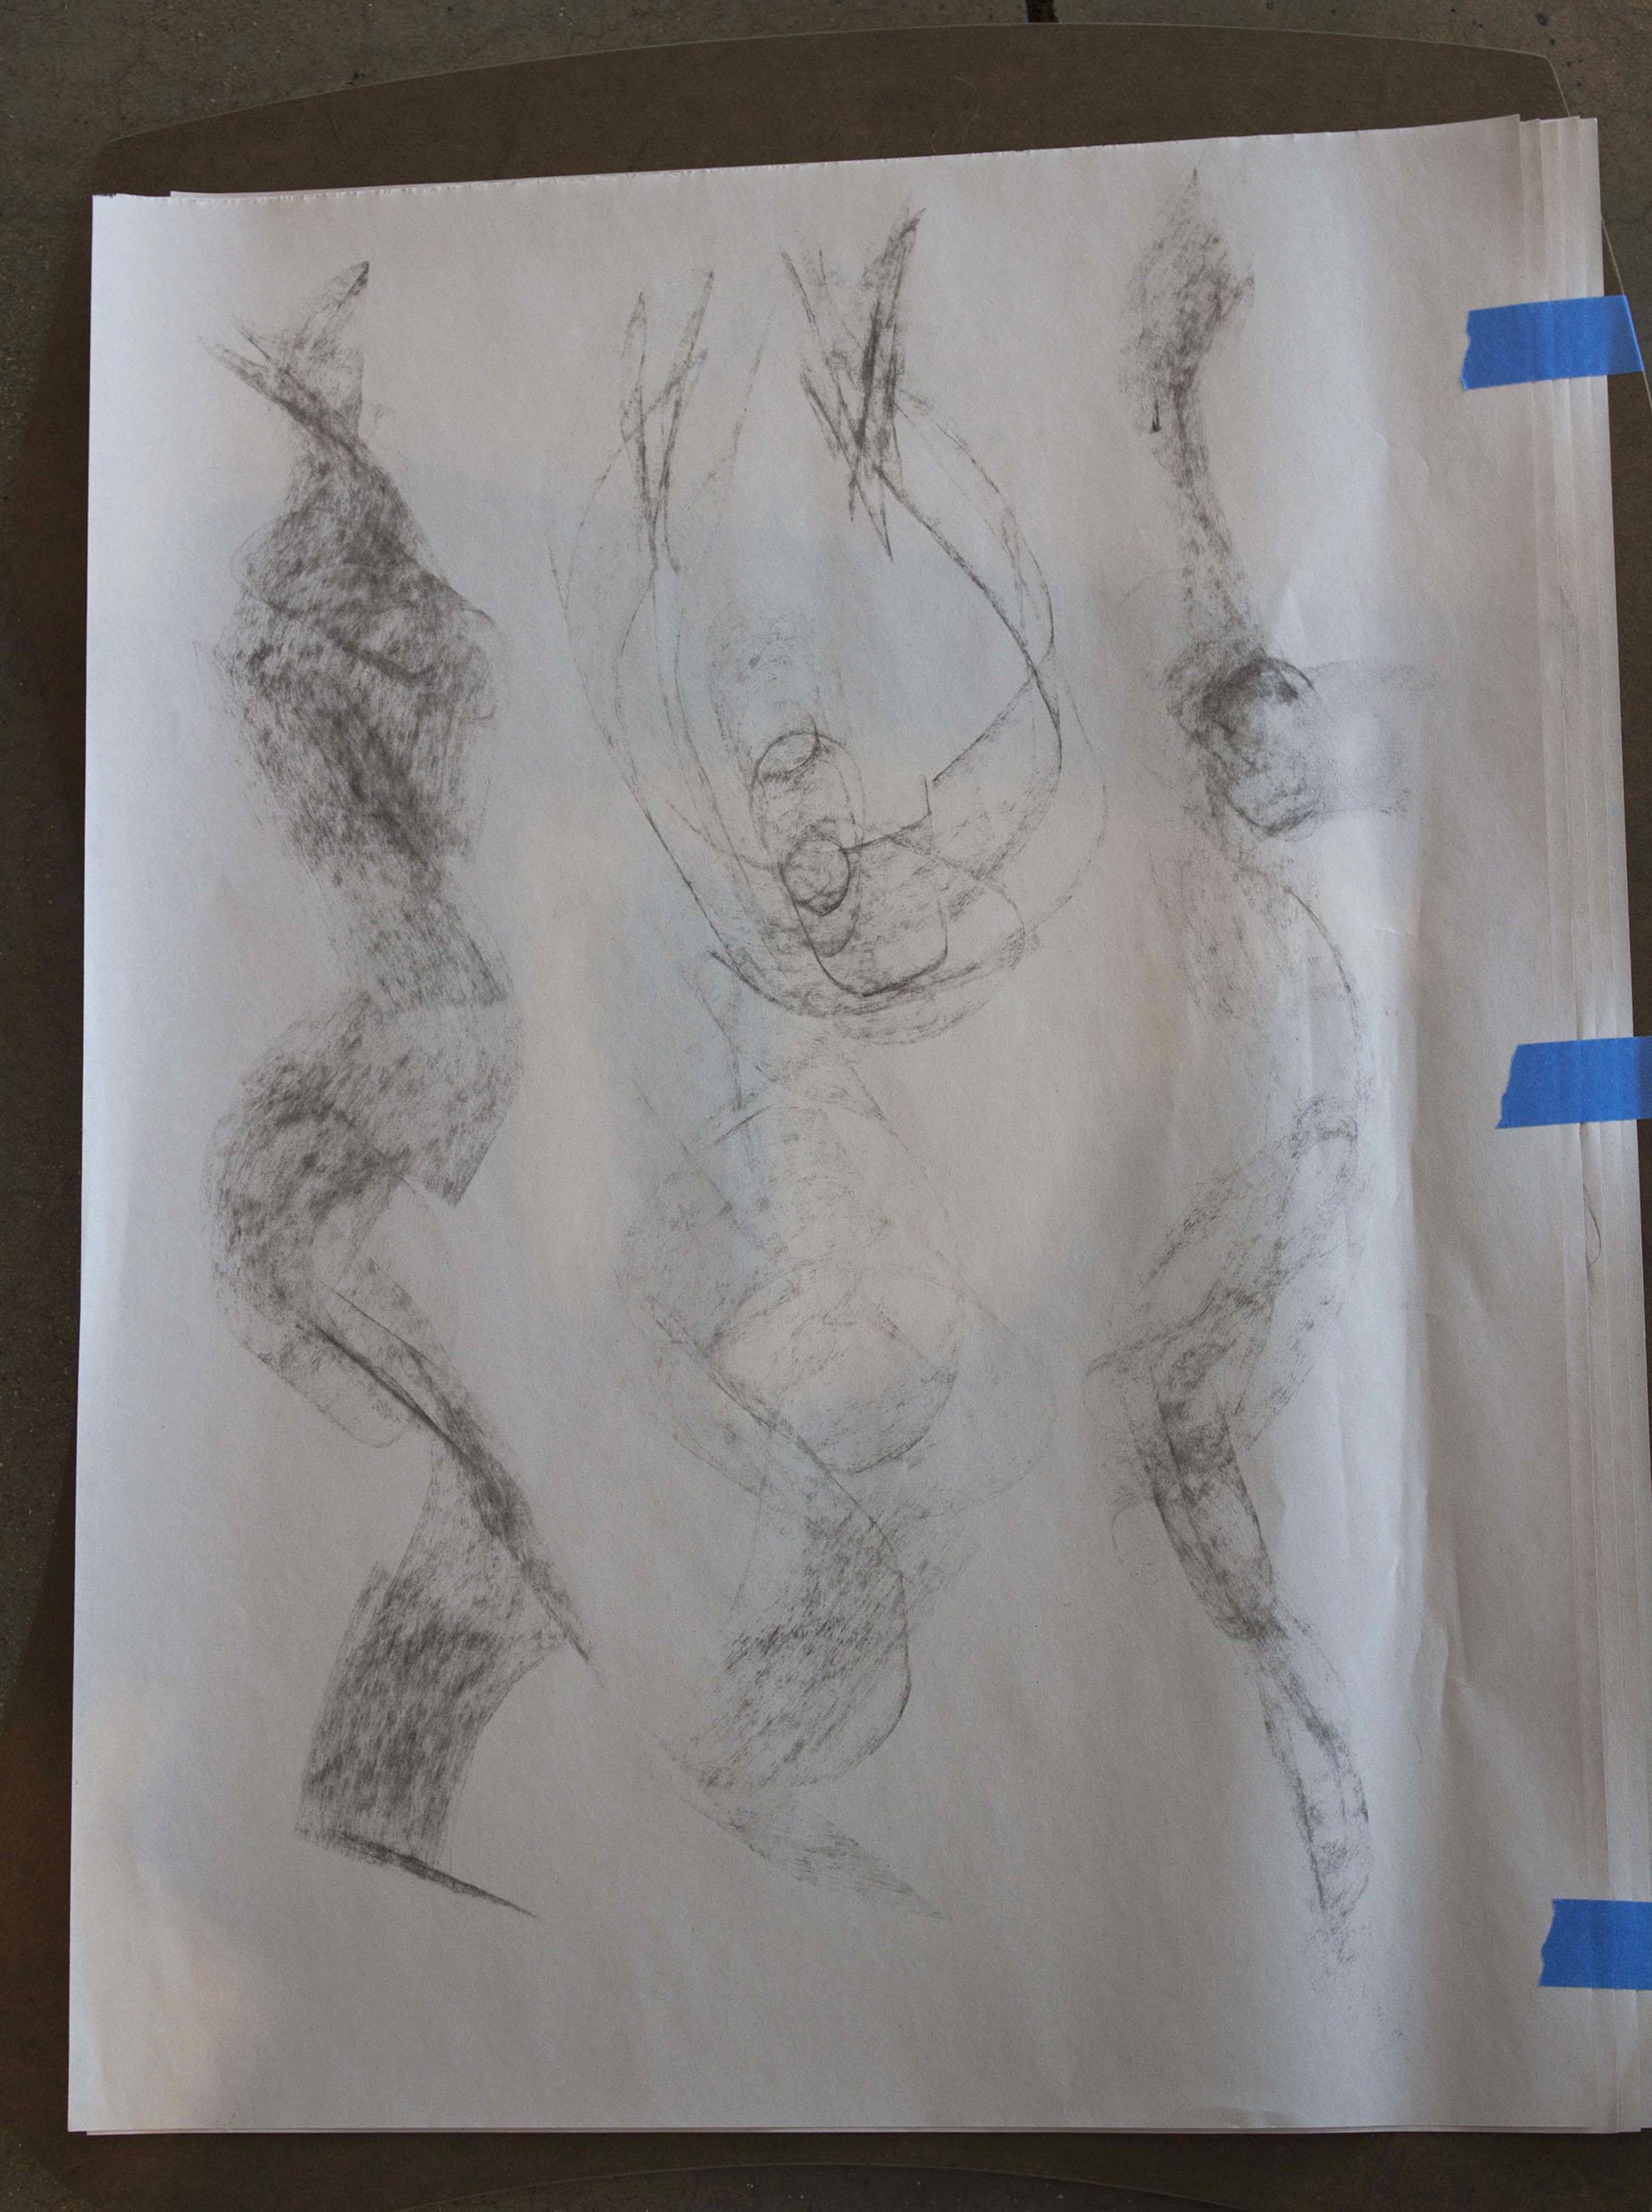 th_drawing_1_edit2